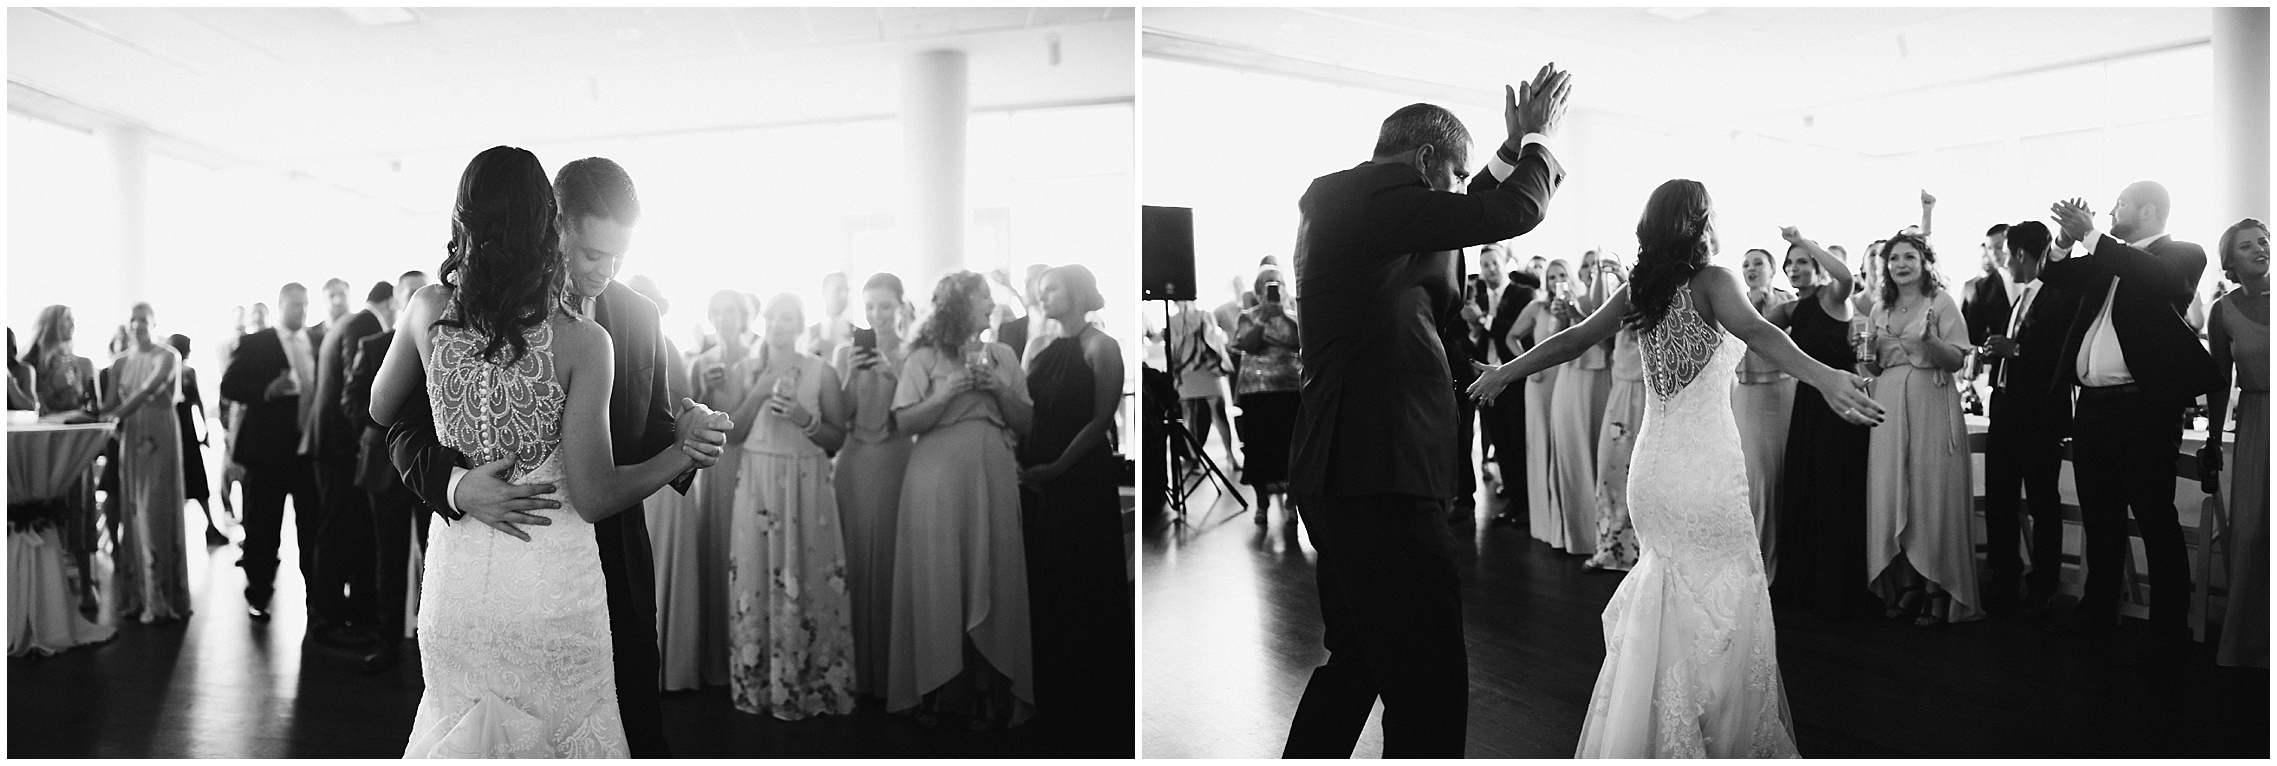 mint_museum_charlotte_wedding_photographer_0410.jpg